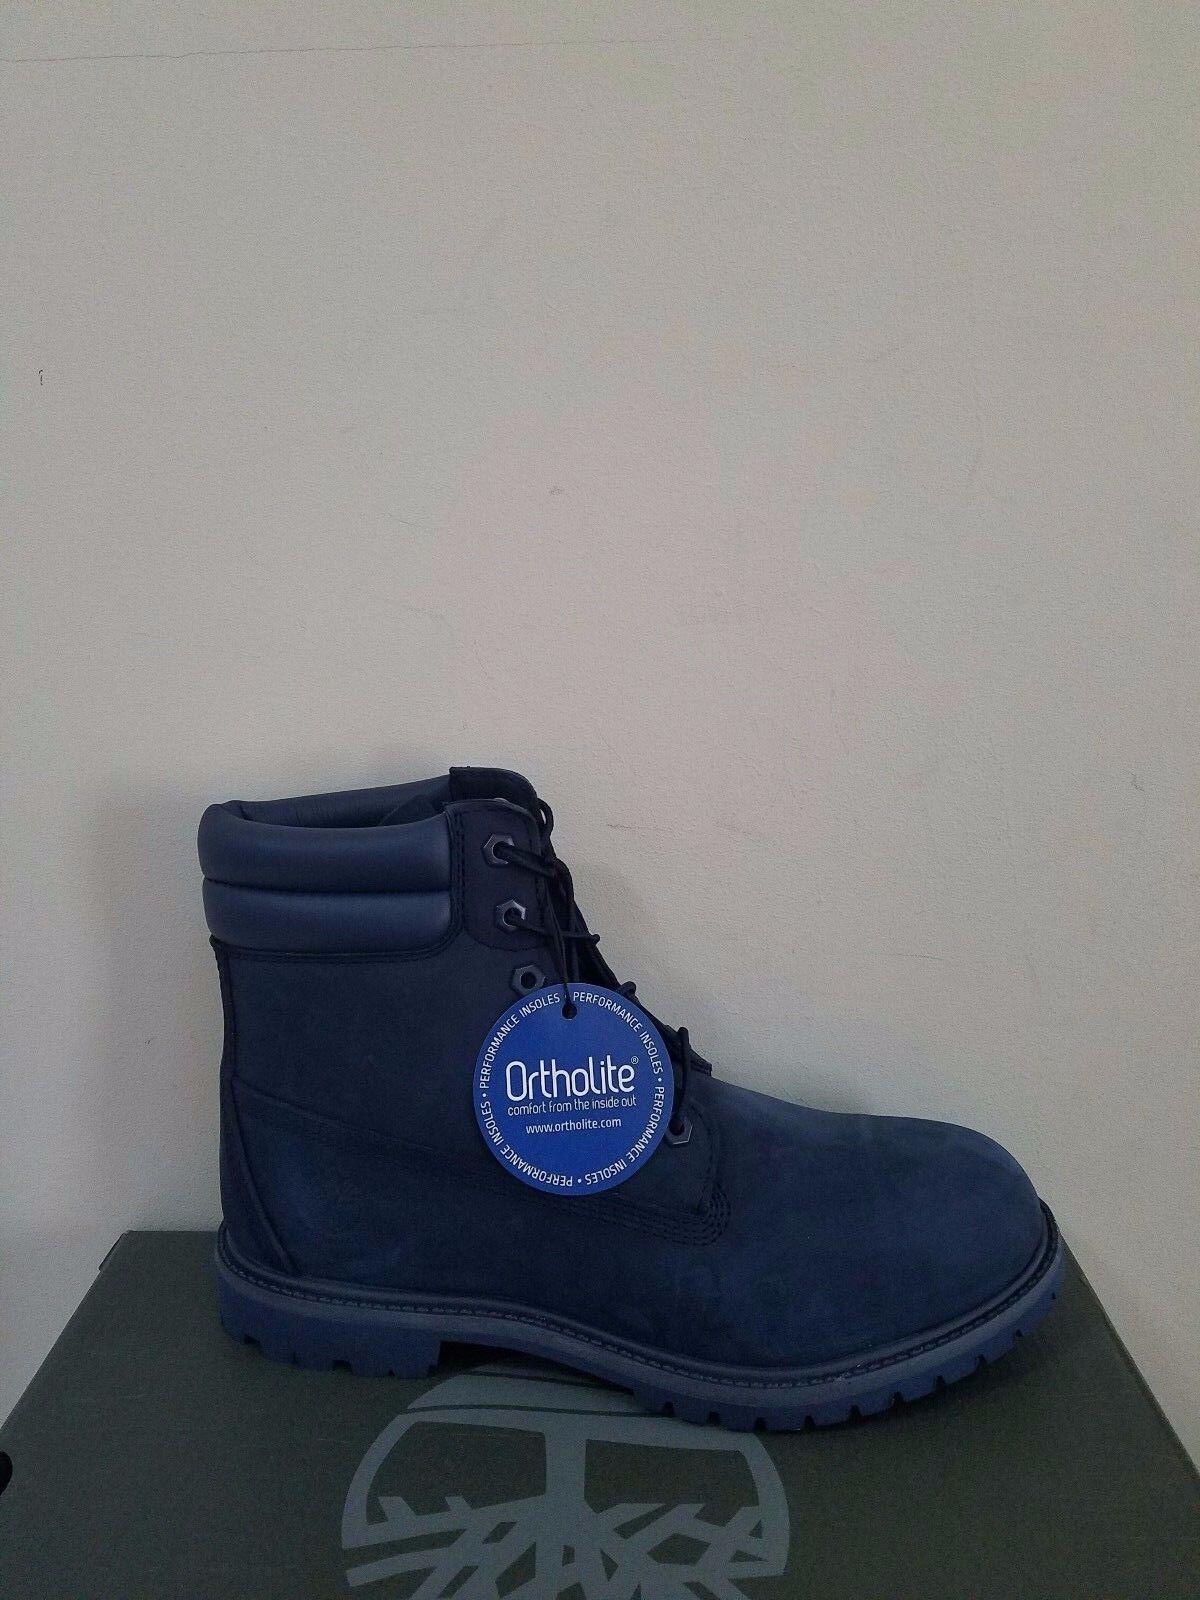 "Timberland Women's 6 inch"" Double Sole Premium Waterproof Navy Boots NIB"